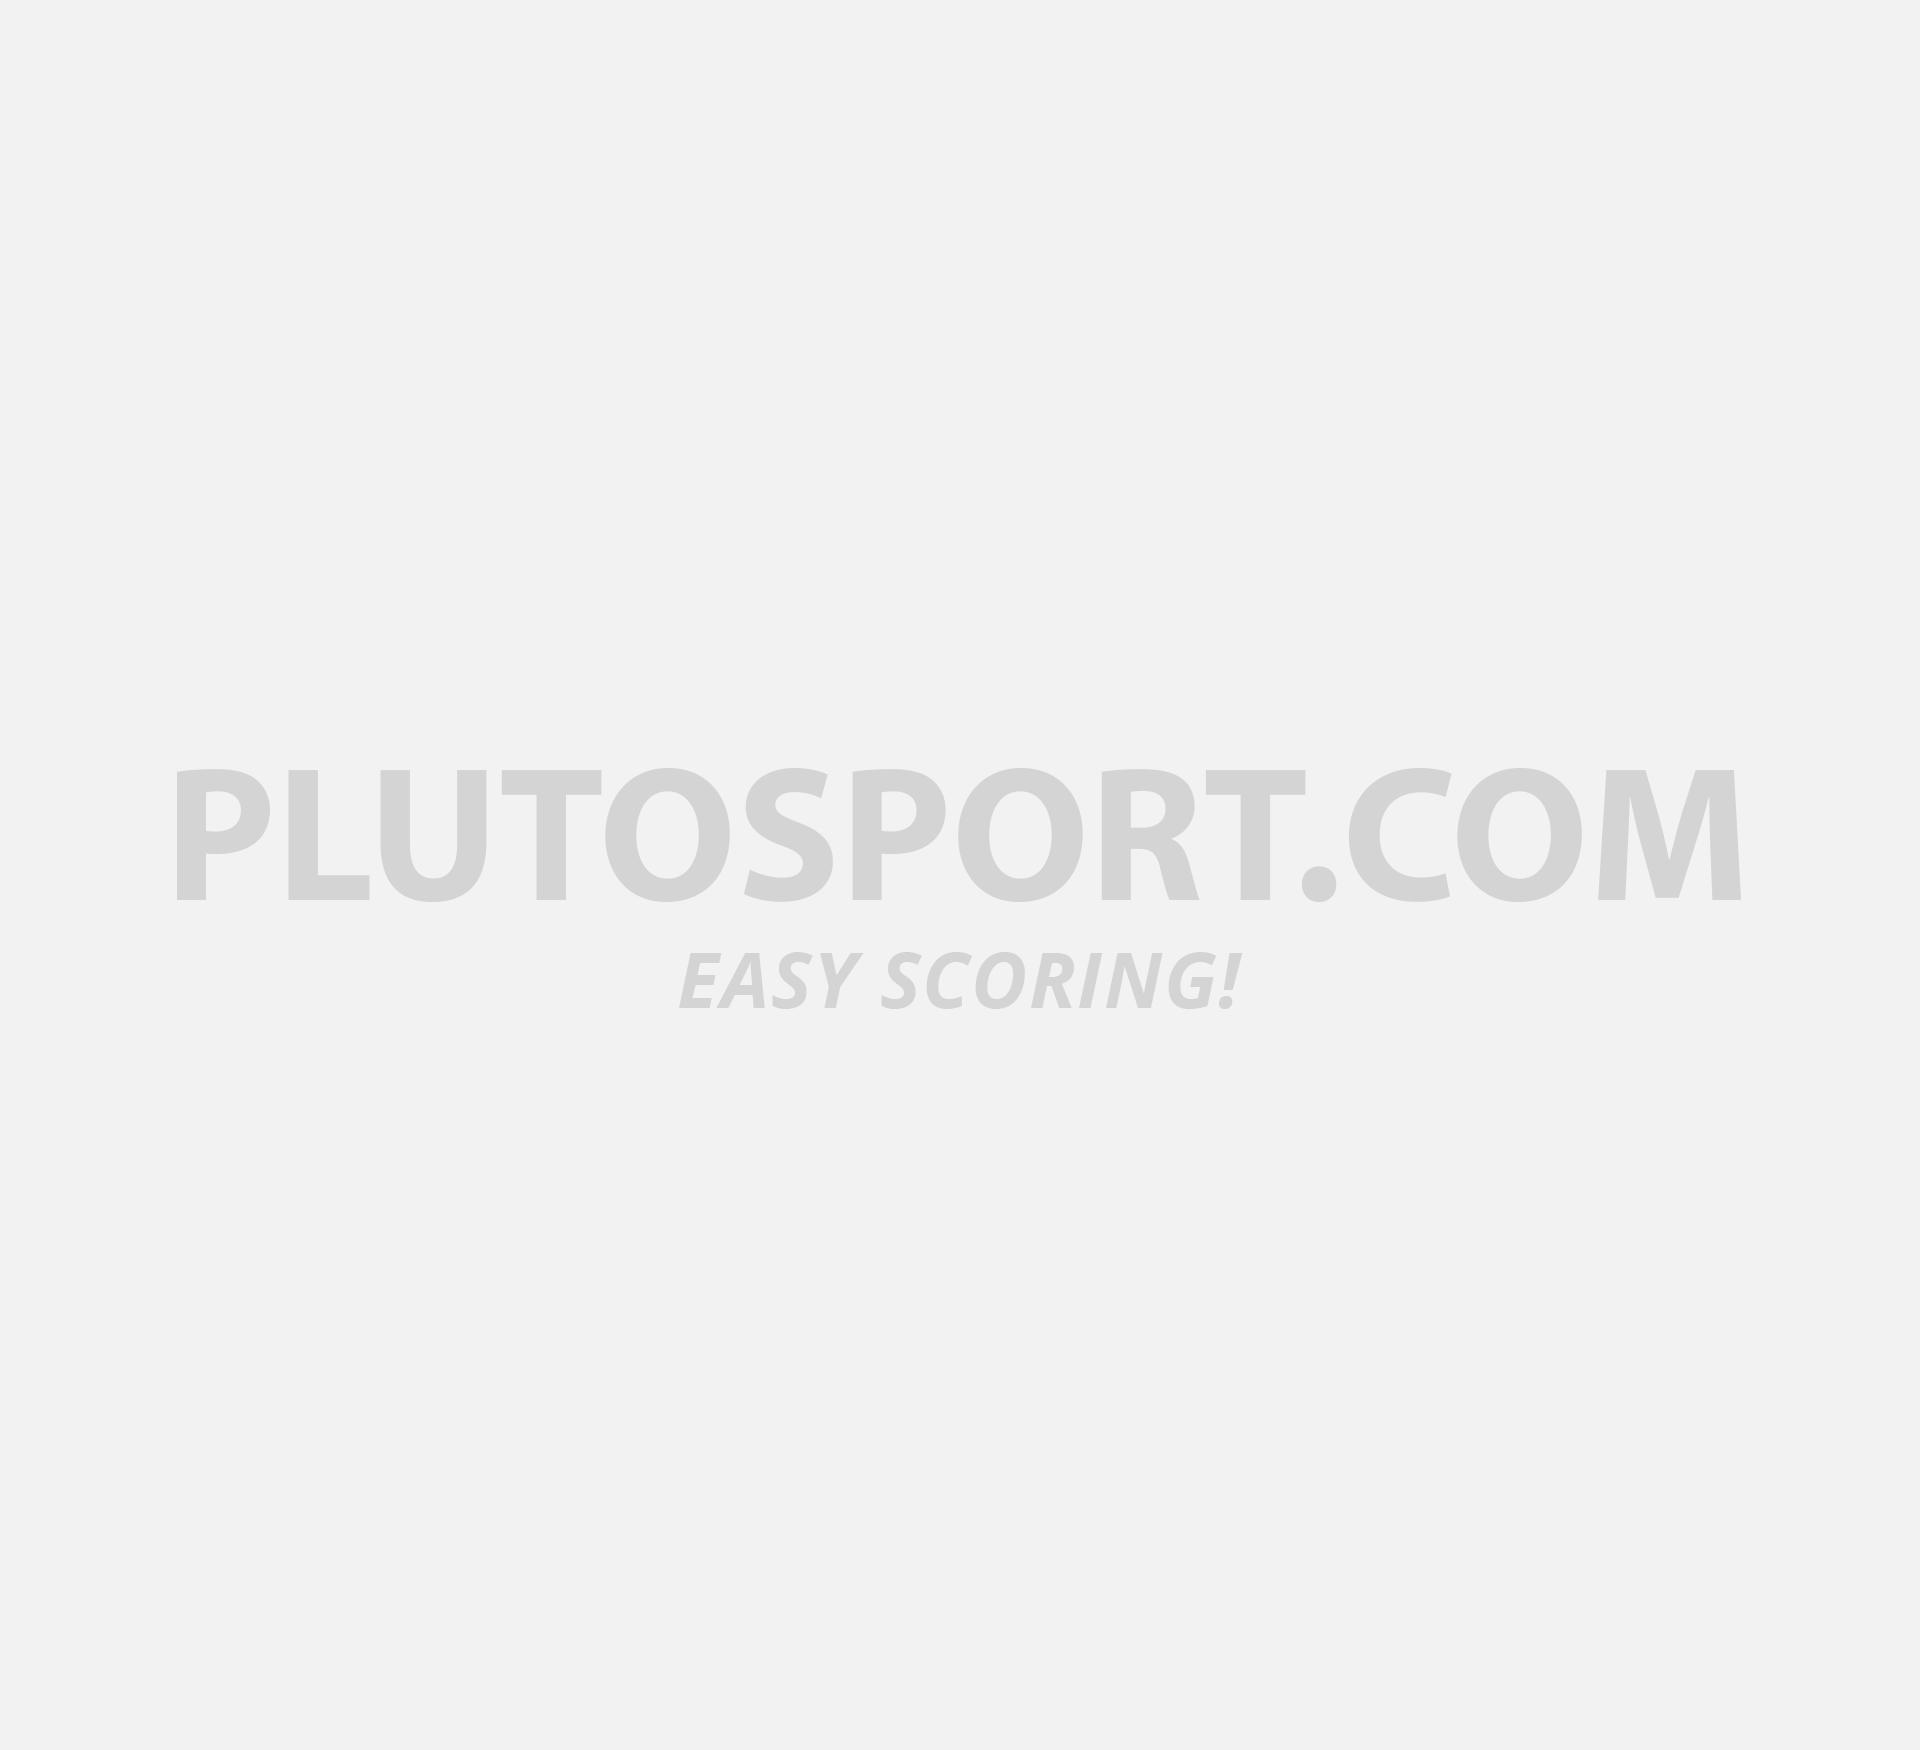 4f5f4a02e4f Puma Vikky Ribbon Platform Ribbon SL Metallic W - Sneakers - Shoes -  Lifestyle - Sports | Plutosport